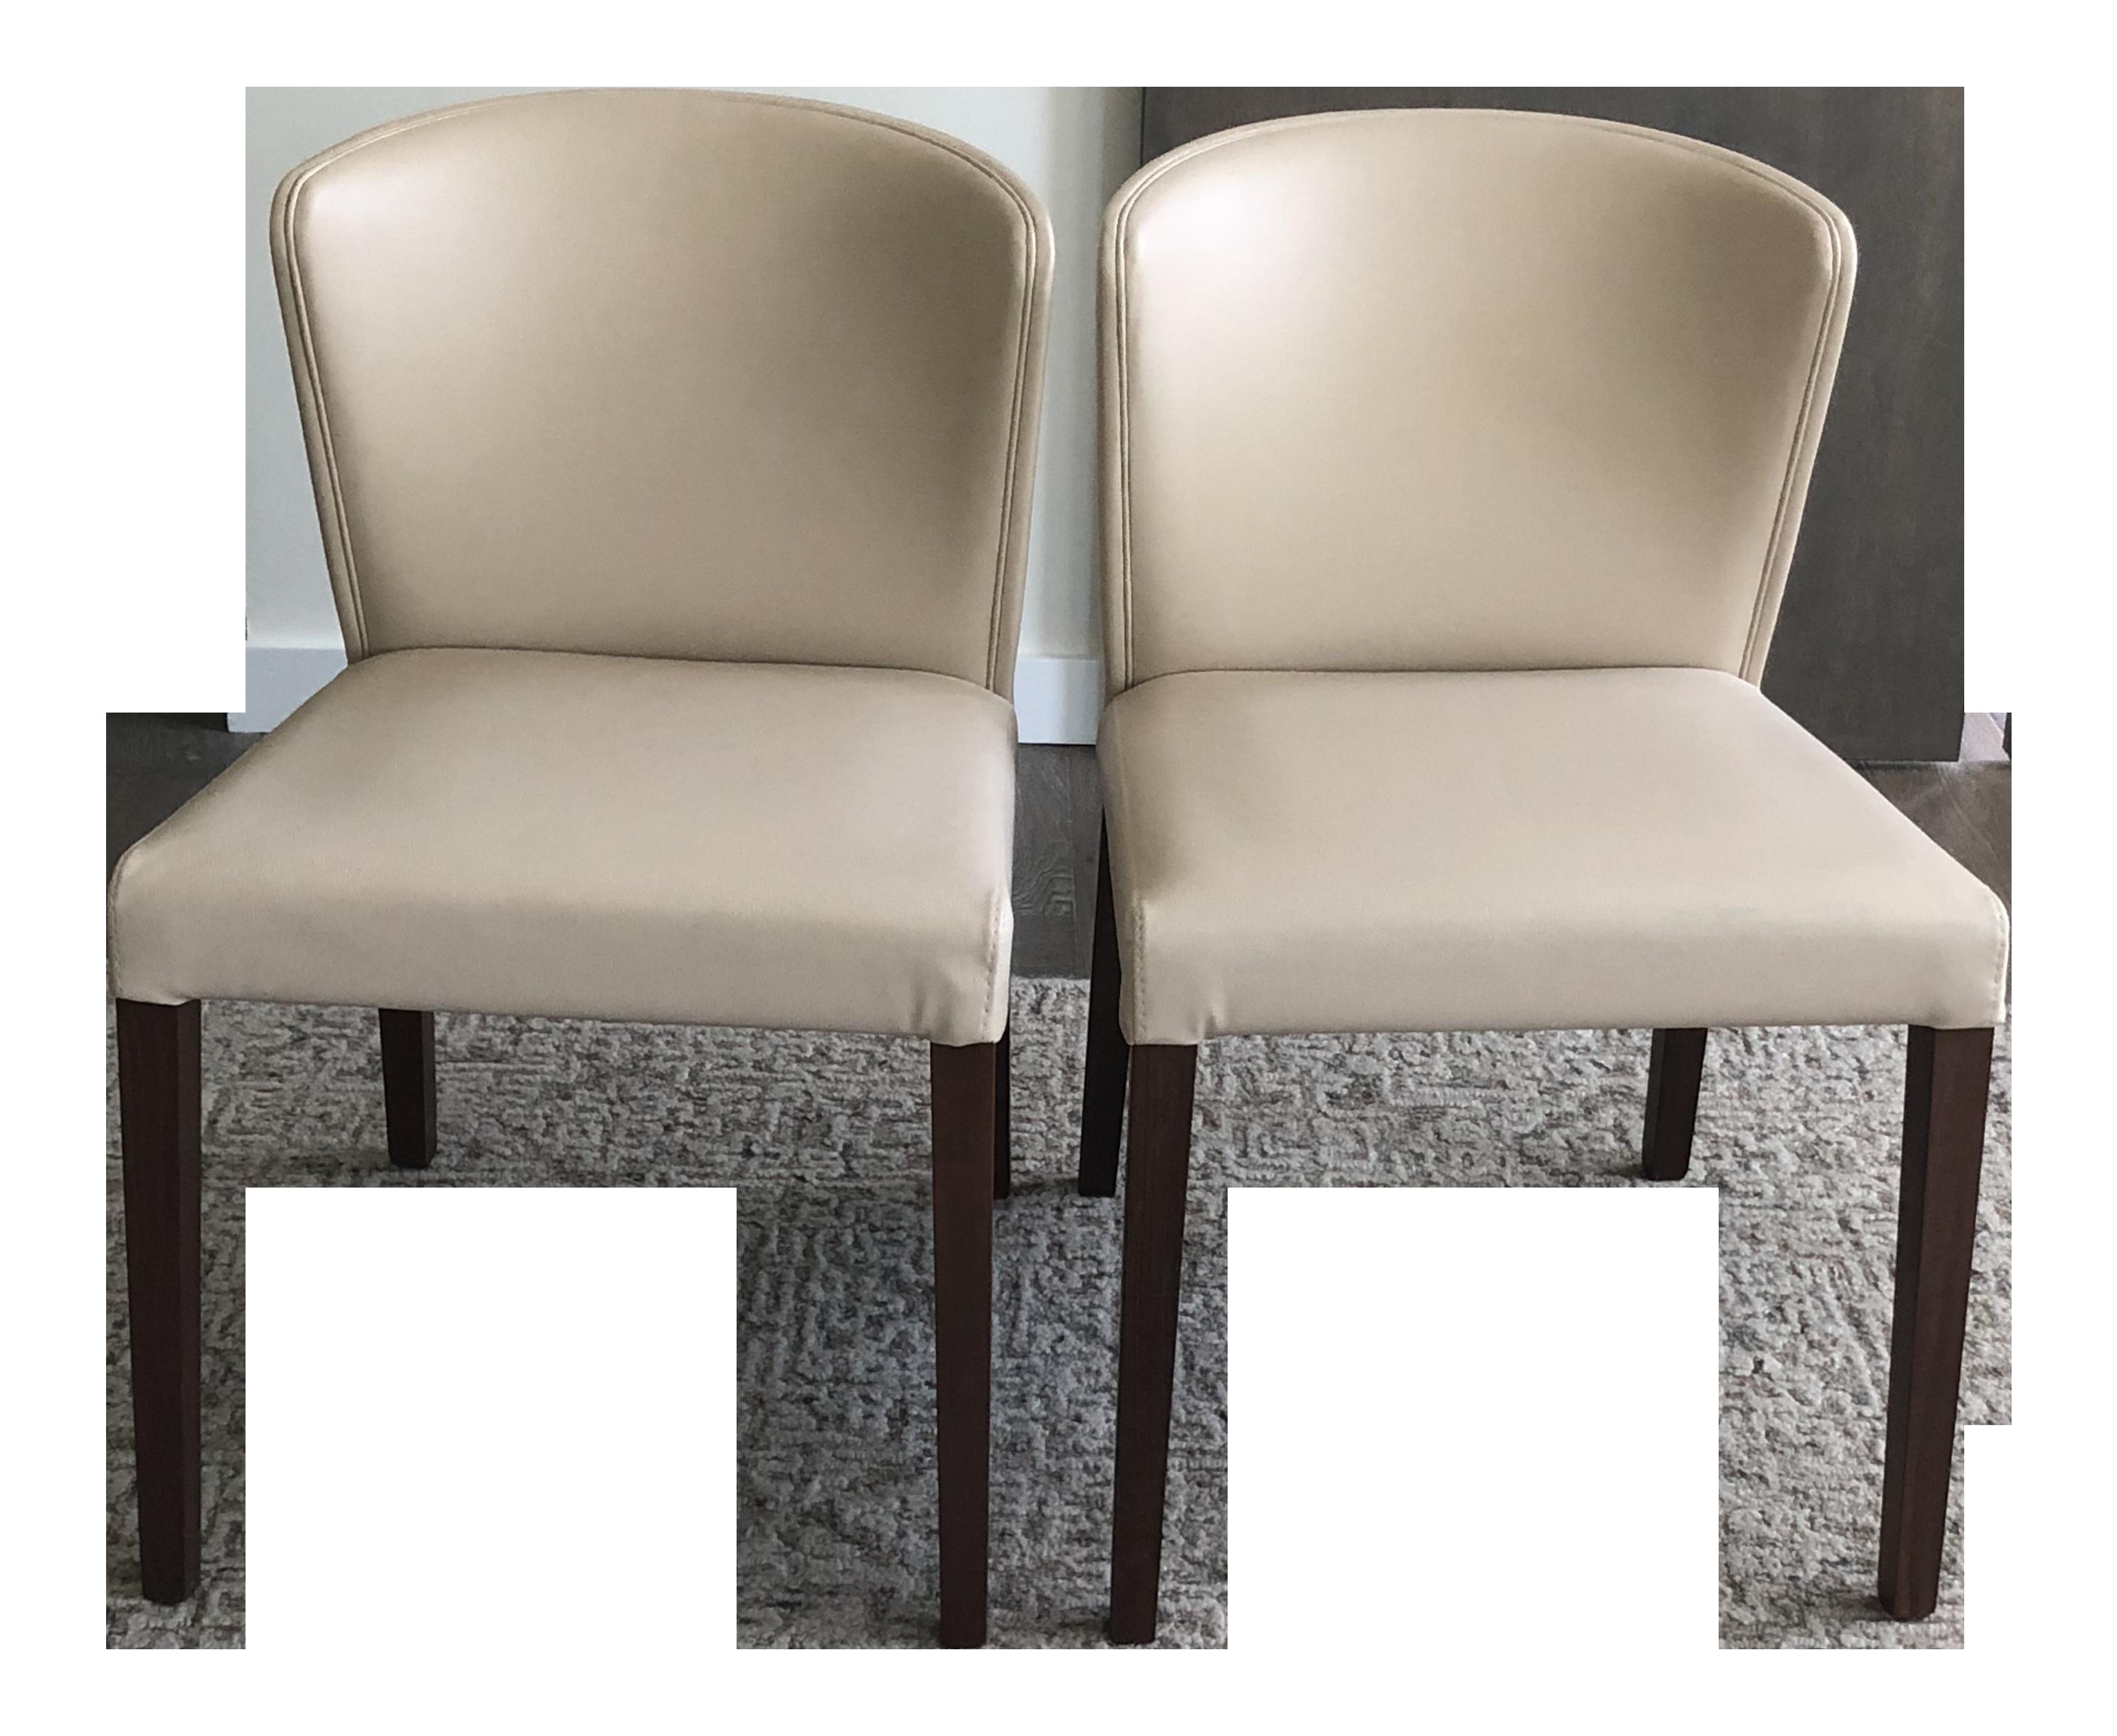 Crate U0026 Barrel Italian Mid Century Modern Dining Chairs   A Pair